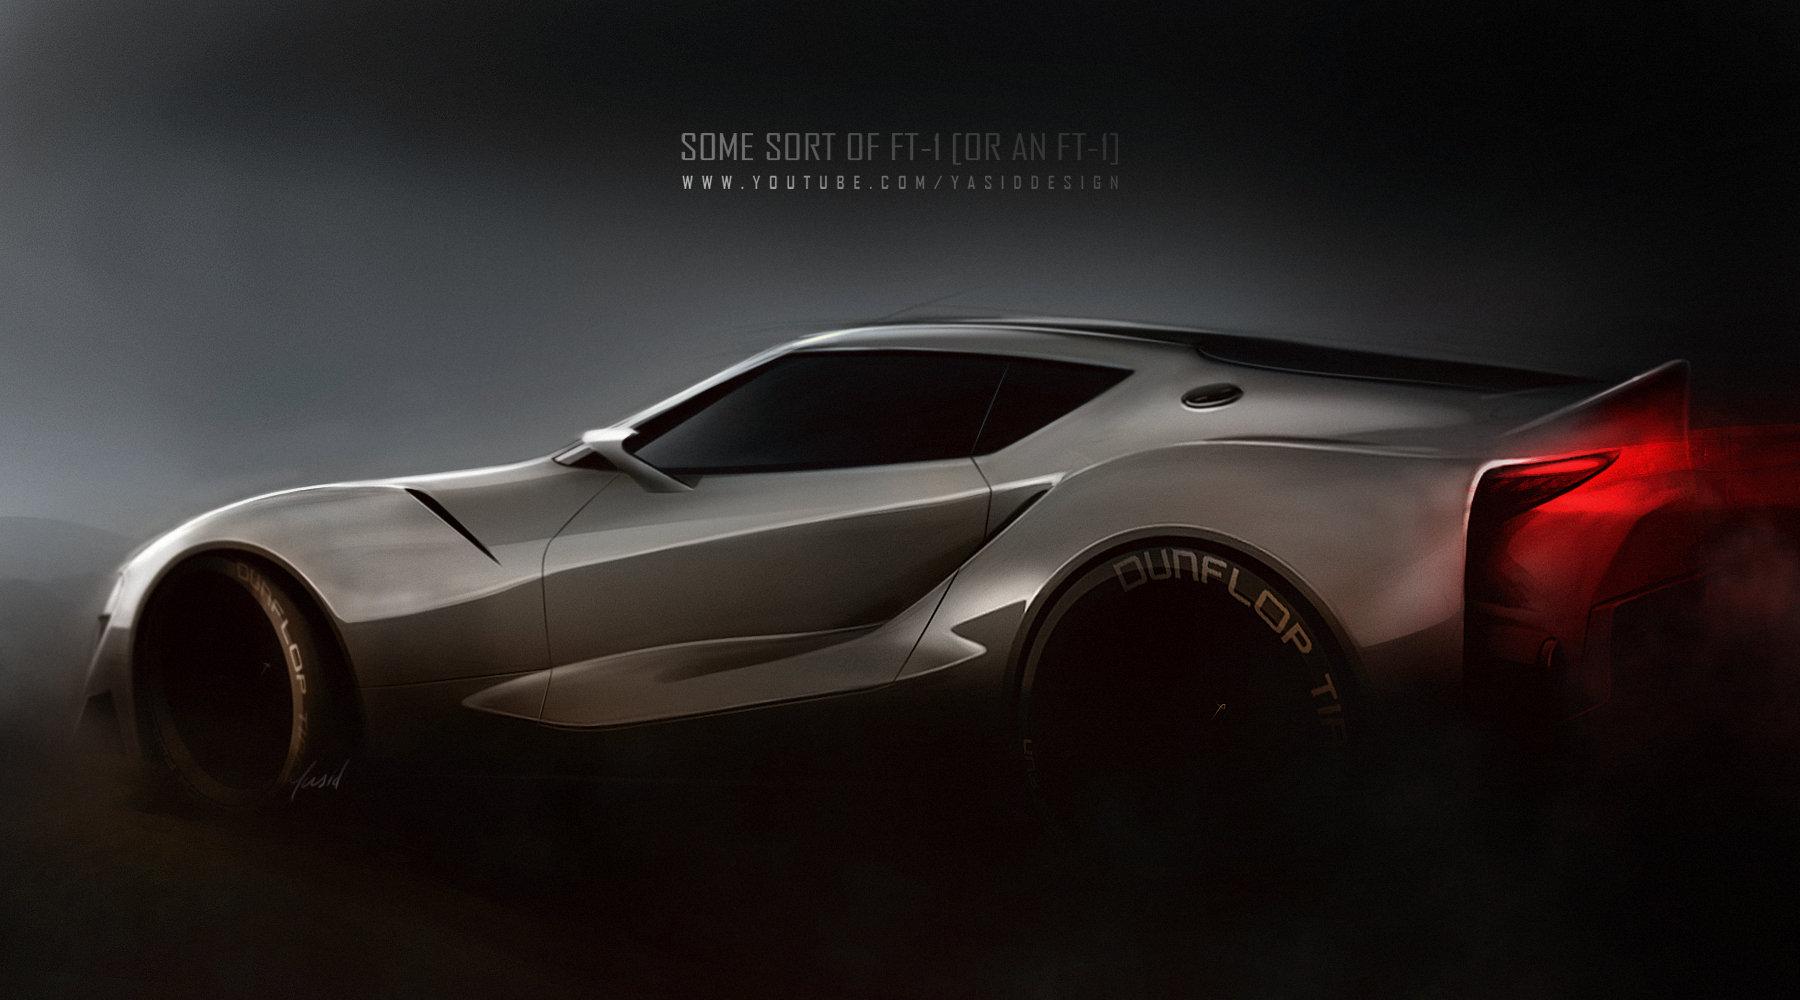 Artstation Sketching Rendering A Toyota Ft 1 Concept From Scratch Al Yasid Oozeear